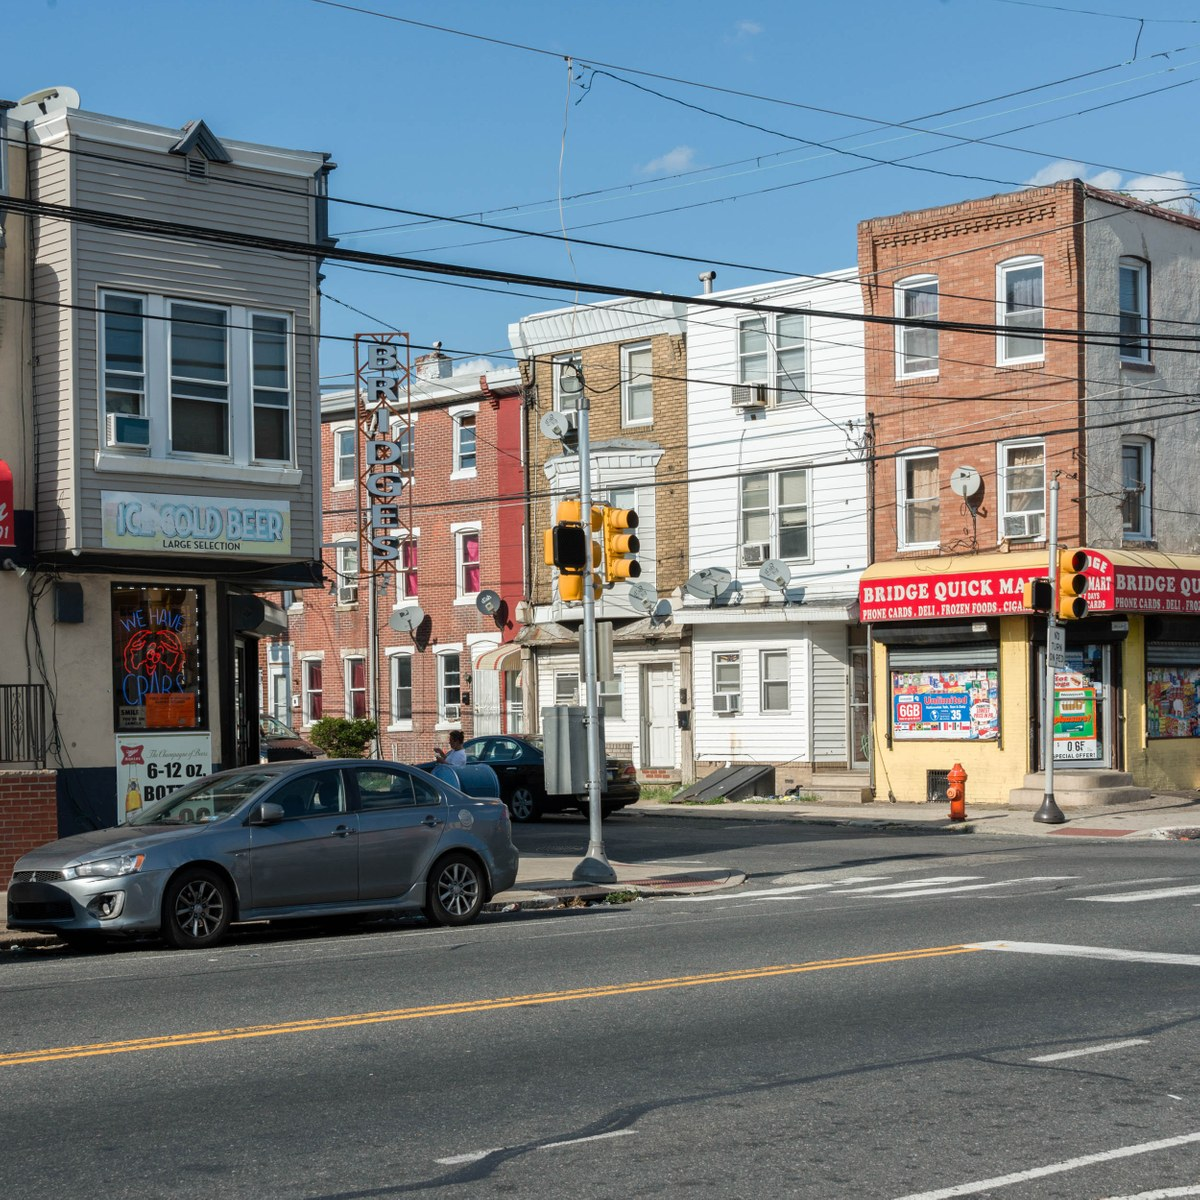 Local Com Homes For Rent: Frankford, Philadelphia PA - Neighborhood Guide